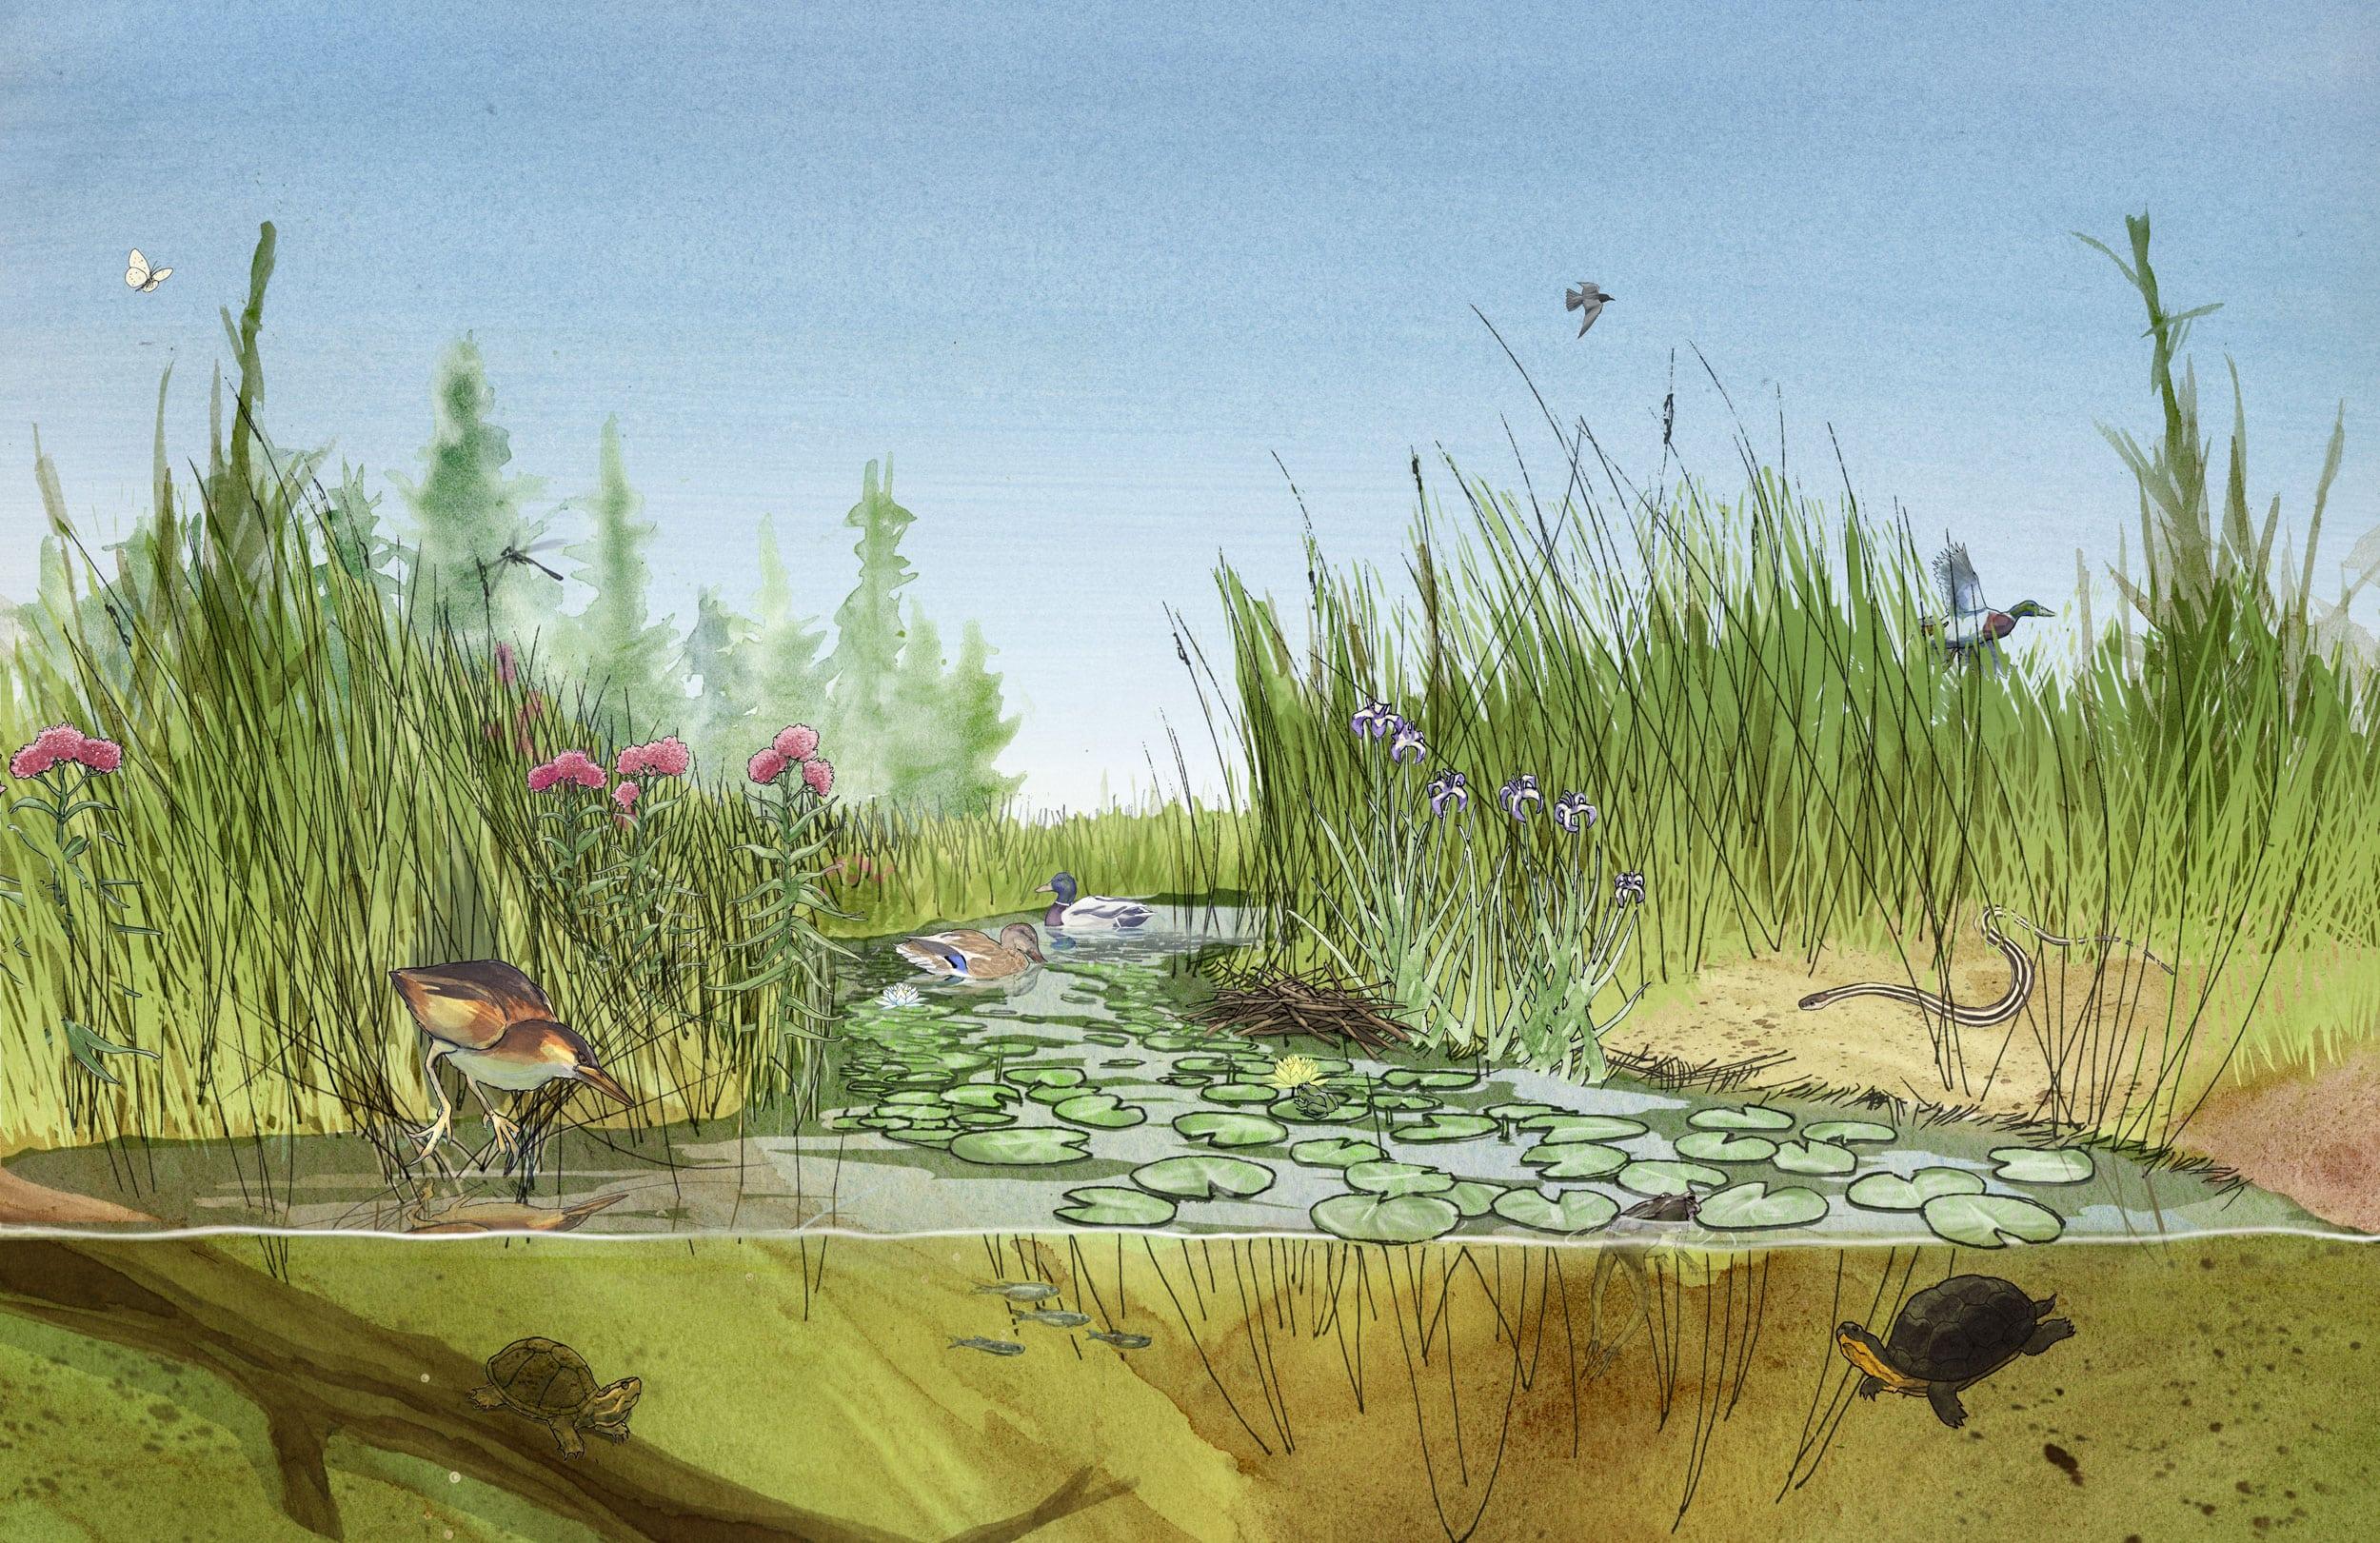 Chris Coles Wildlife And Habitat Along The Trent Severn